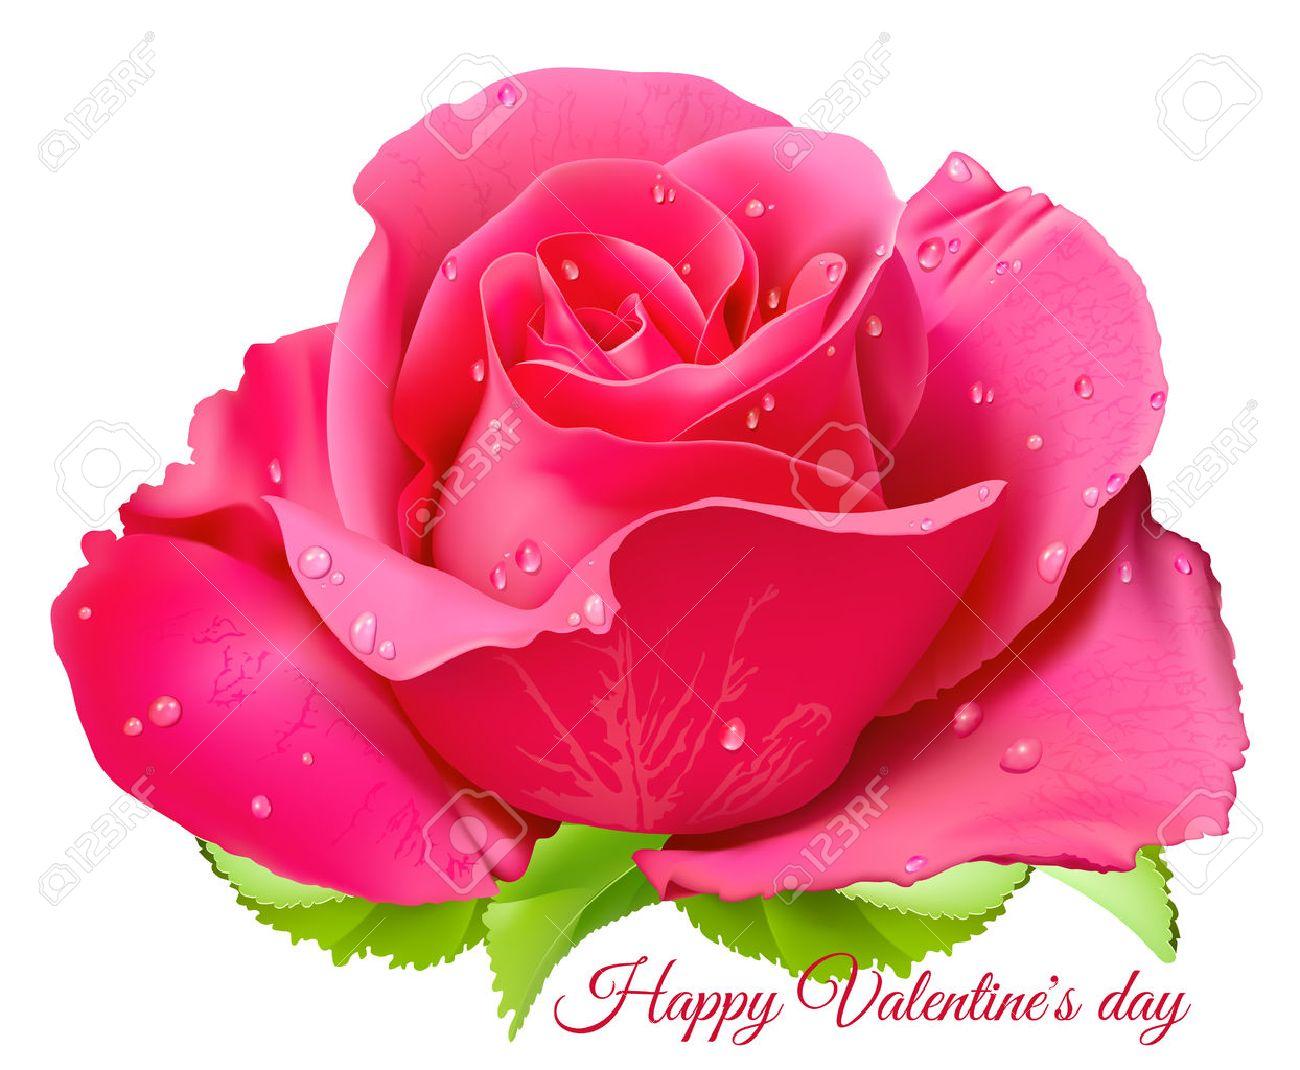 Pink Rose Happy Valentine Day Fully Editable Handmade Mesh